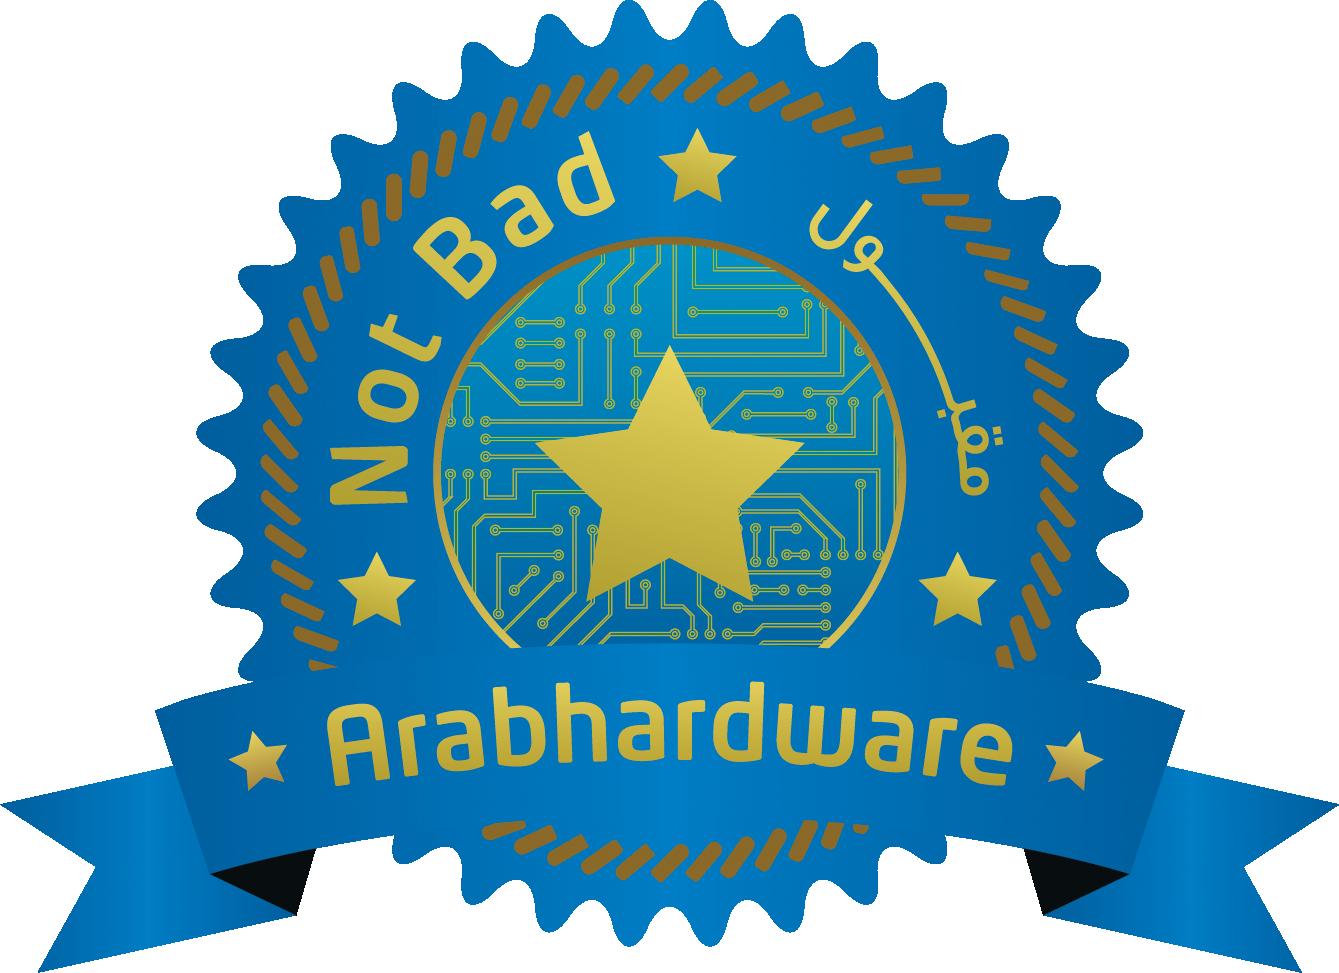 Mushkin Ridgeback DDR3 CL9 Dual Channel Kit 8GB Review- Arabhardware.net